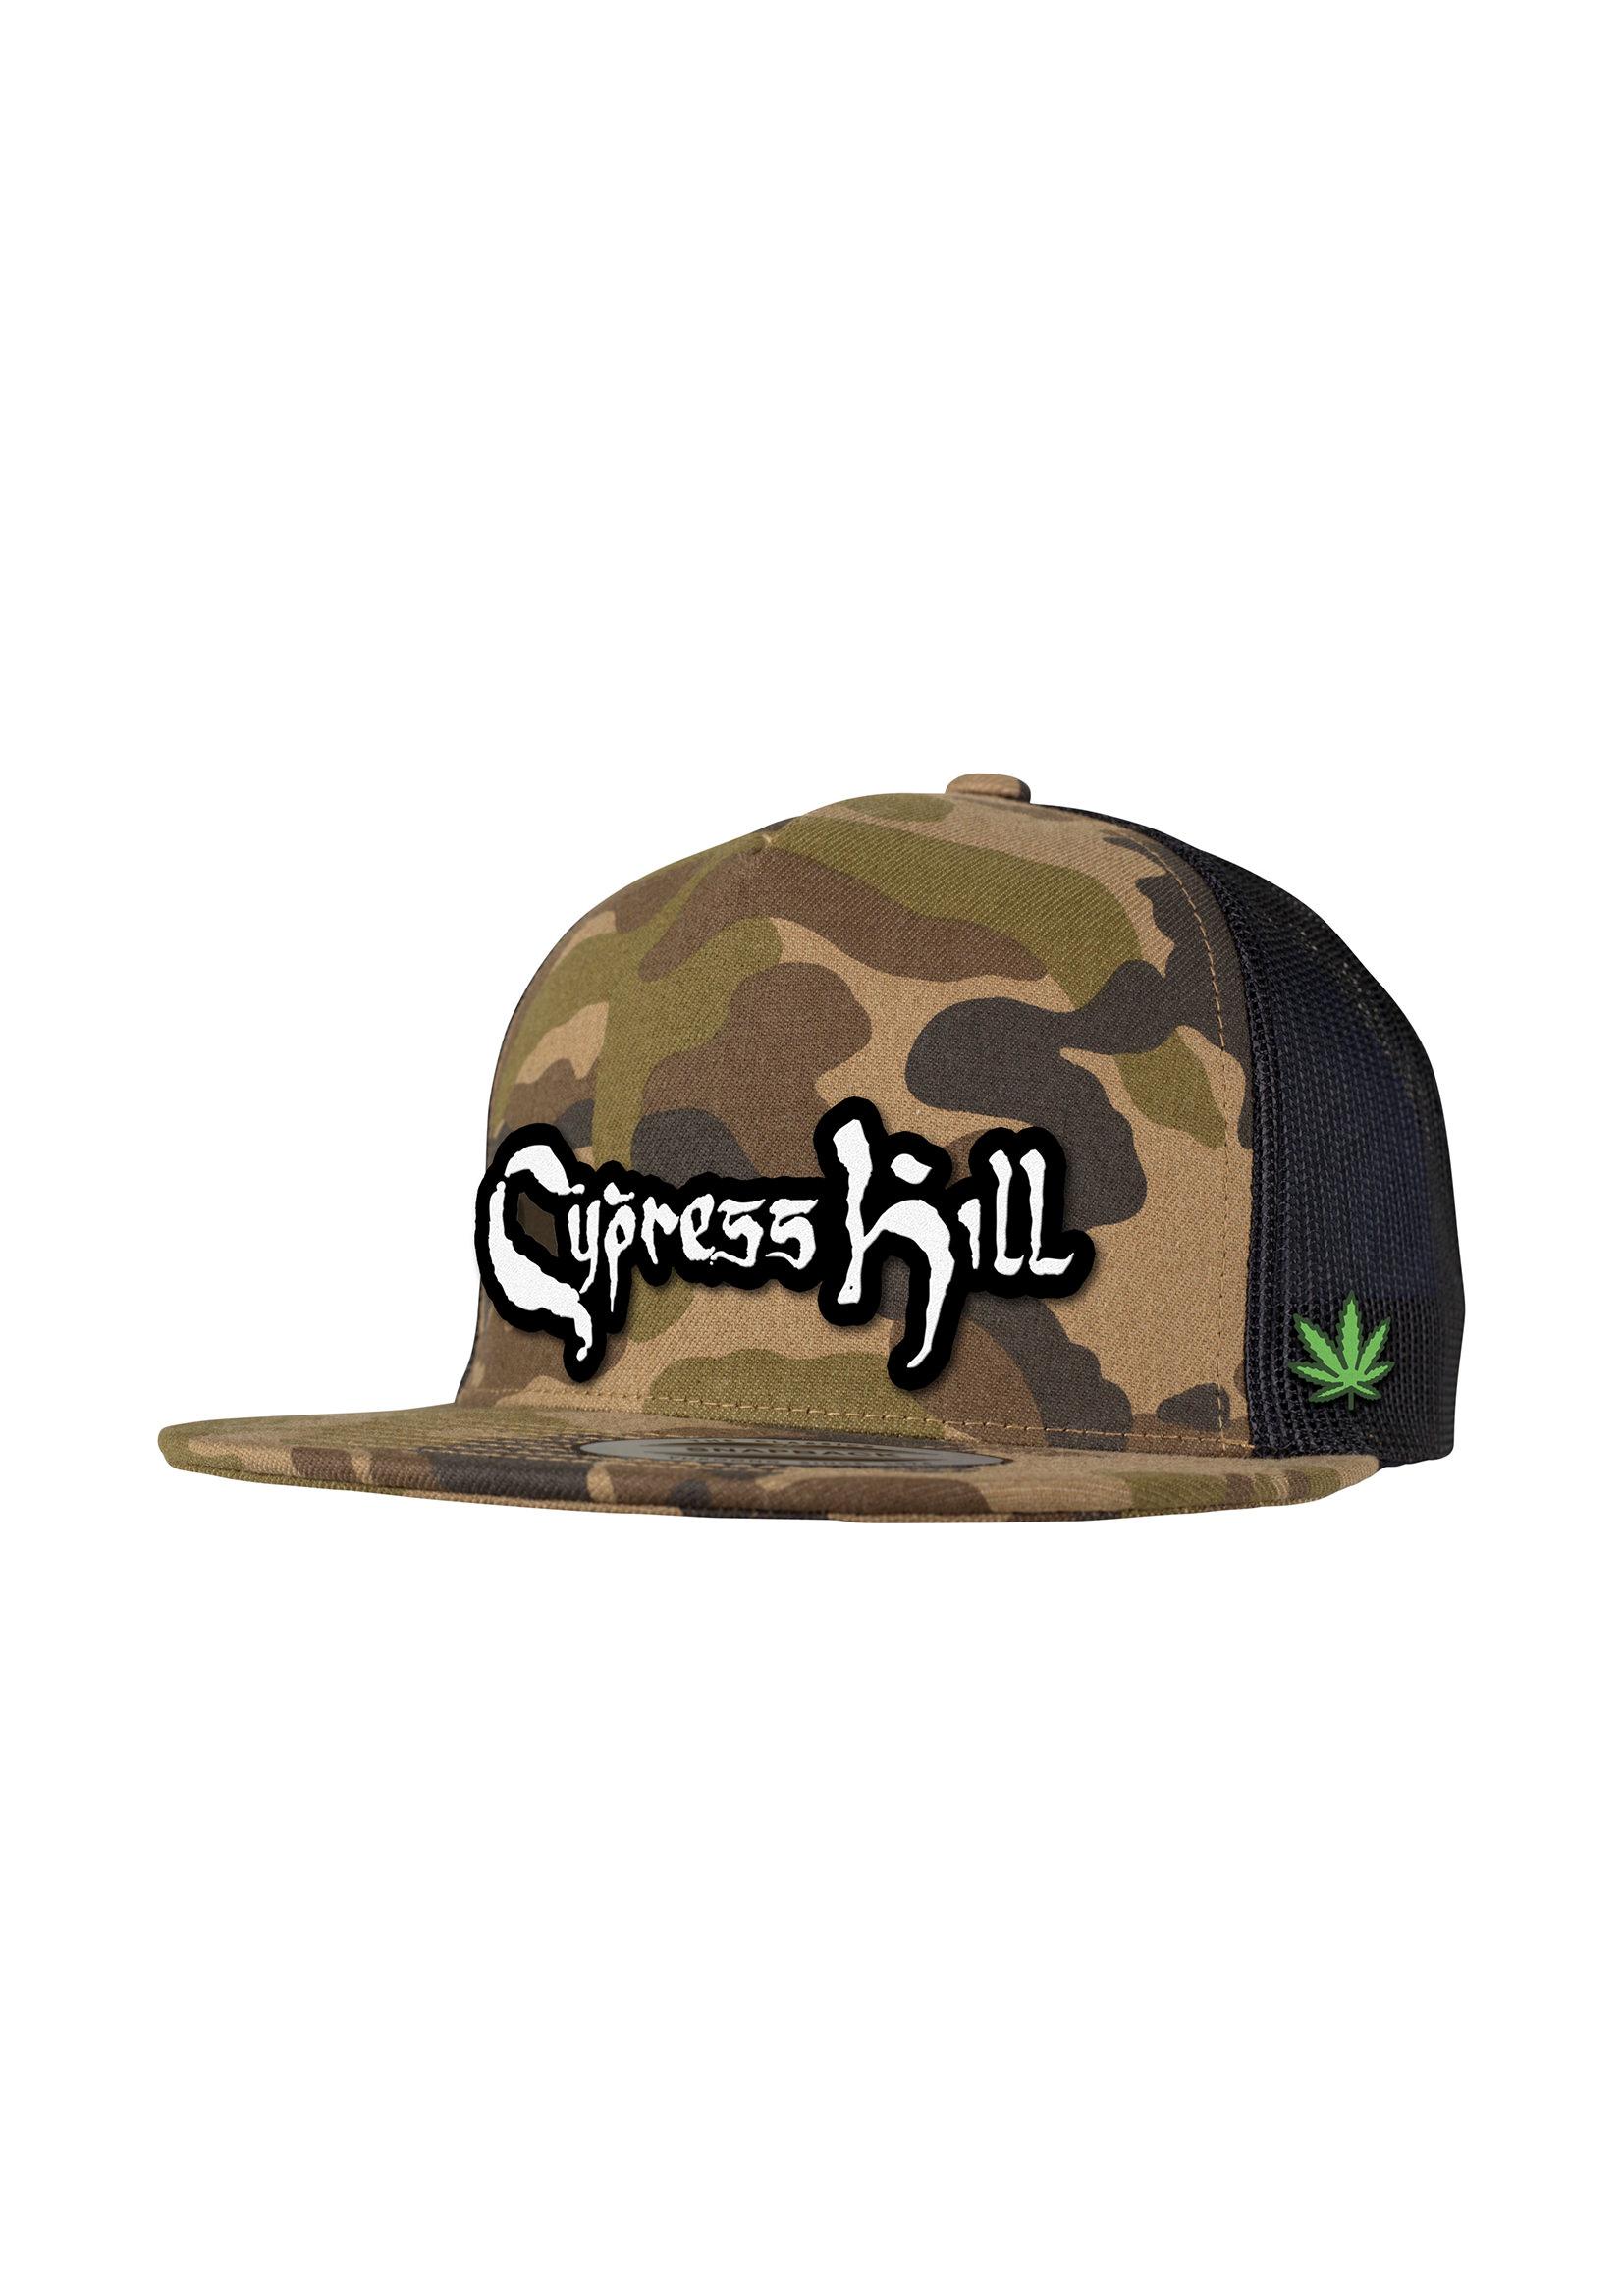 Logo & Leaf - Camo Baseball Cap - Cypress Hill